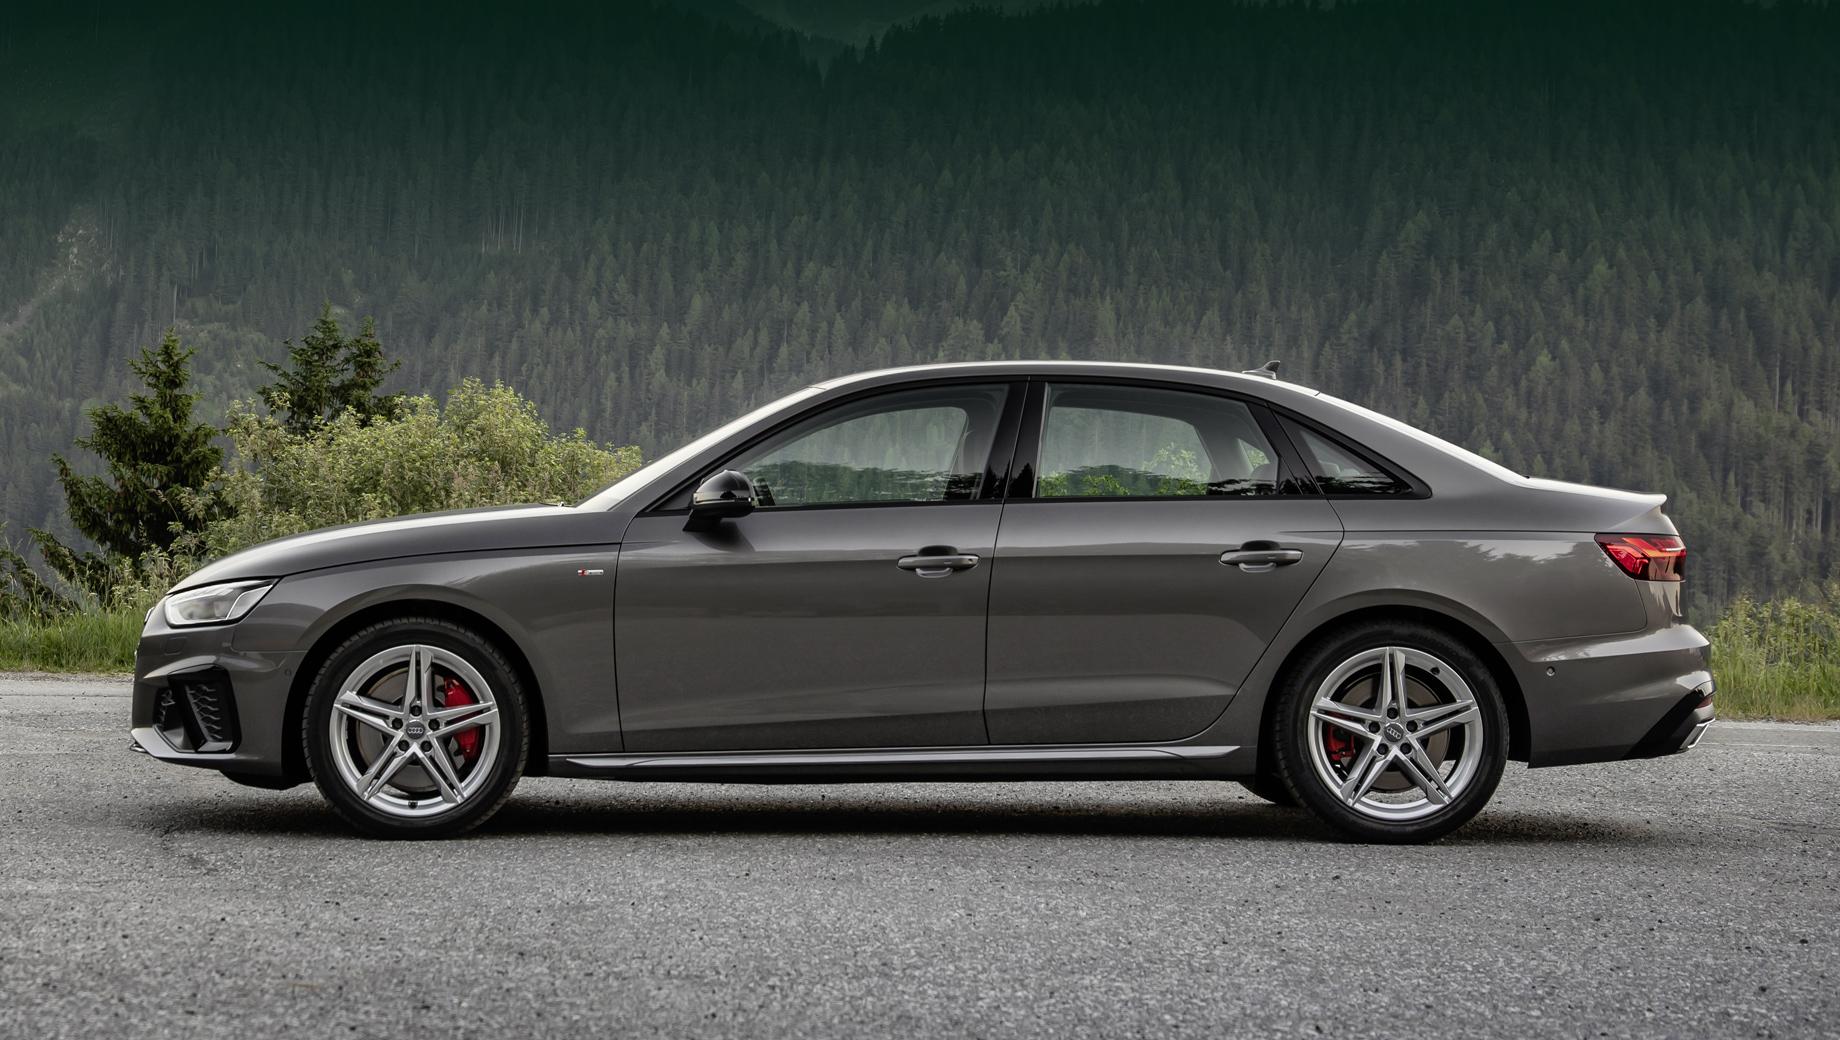 Audi a4,Audi a5,Audi a5 coupe,Audi a5 sportback,Audi a6,Audi q3,Audi q7,Audi q8. Первые программы машин по подписке от концерна Volkswagen будут означать долговременную аренду на один год, но позднее появятся версии программ с более короткими сроками.